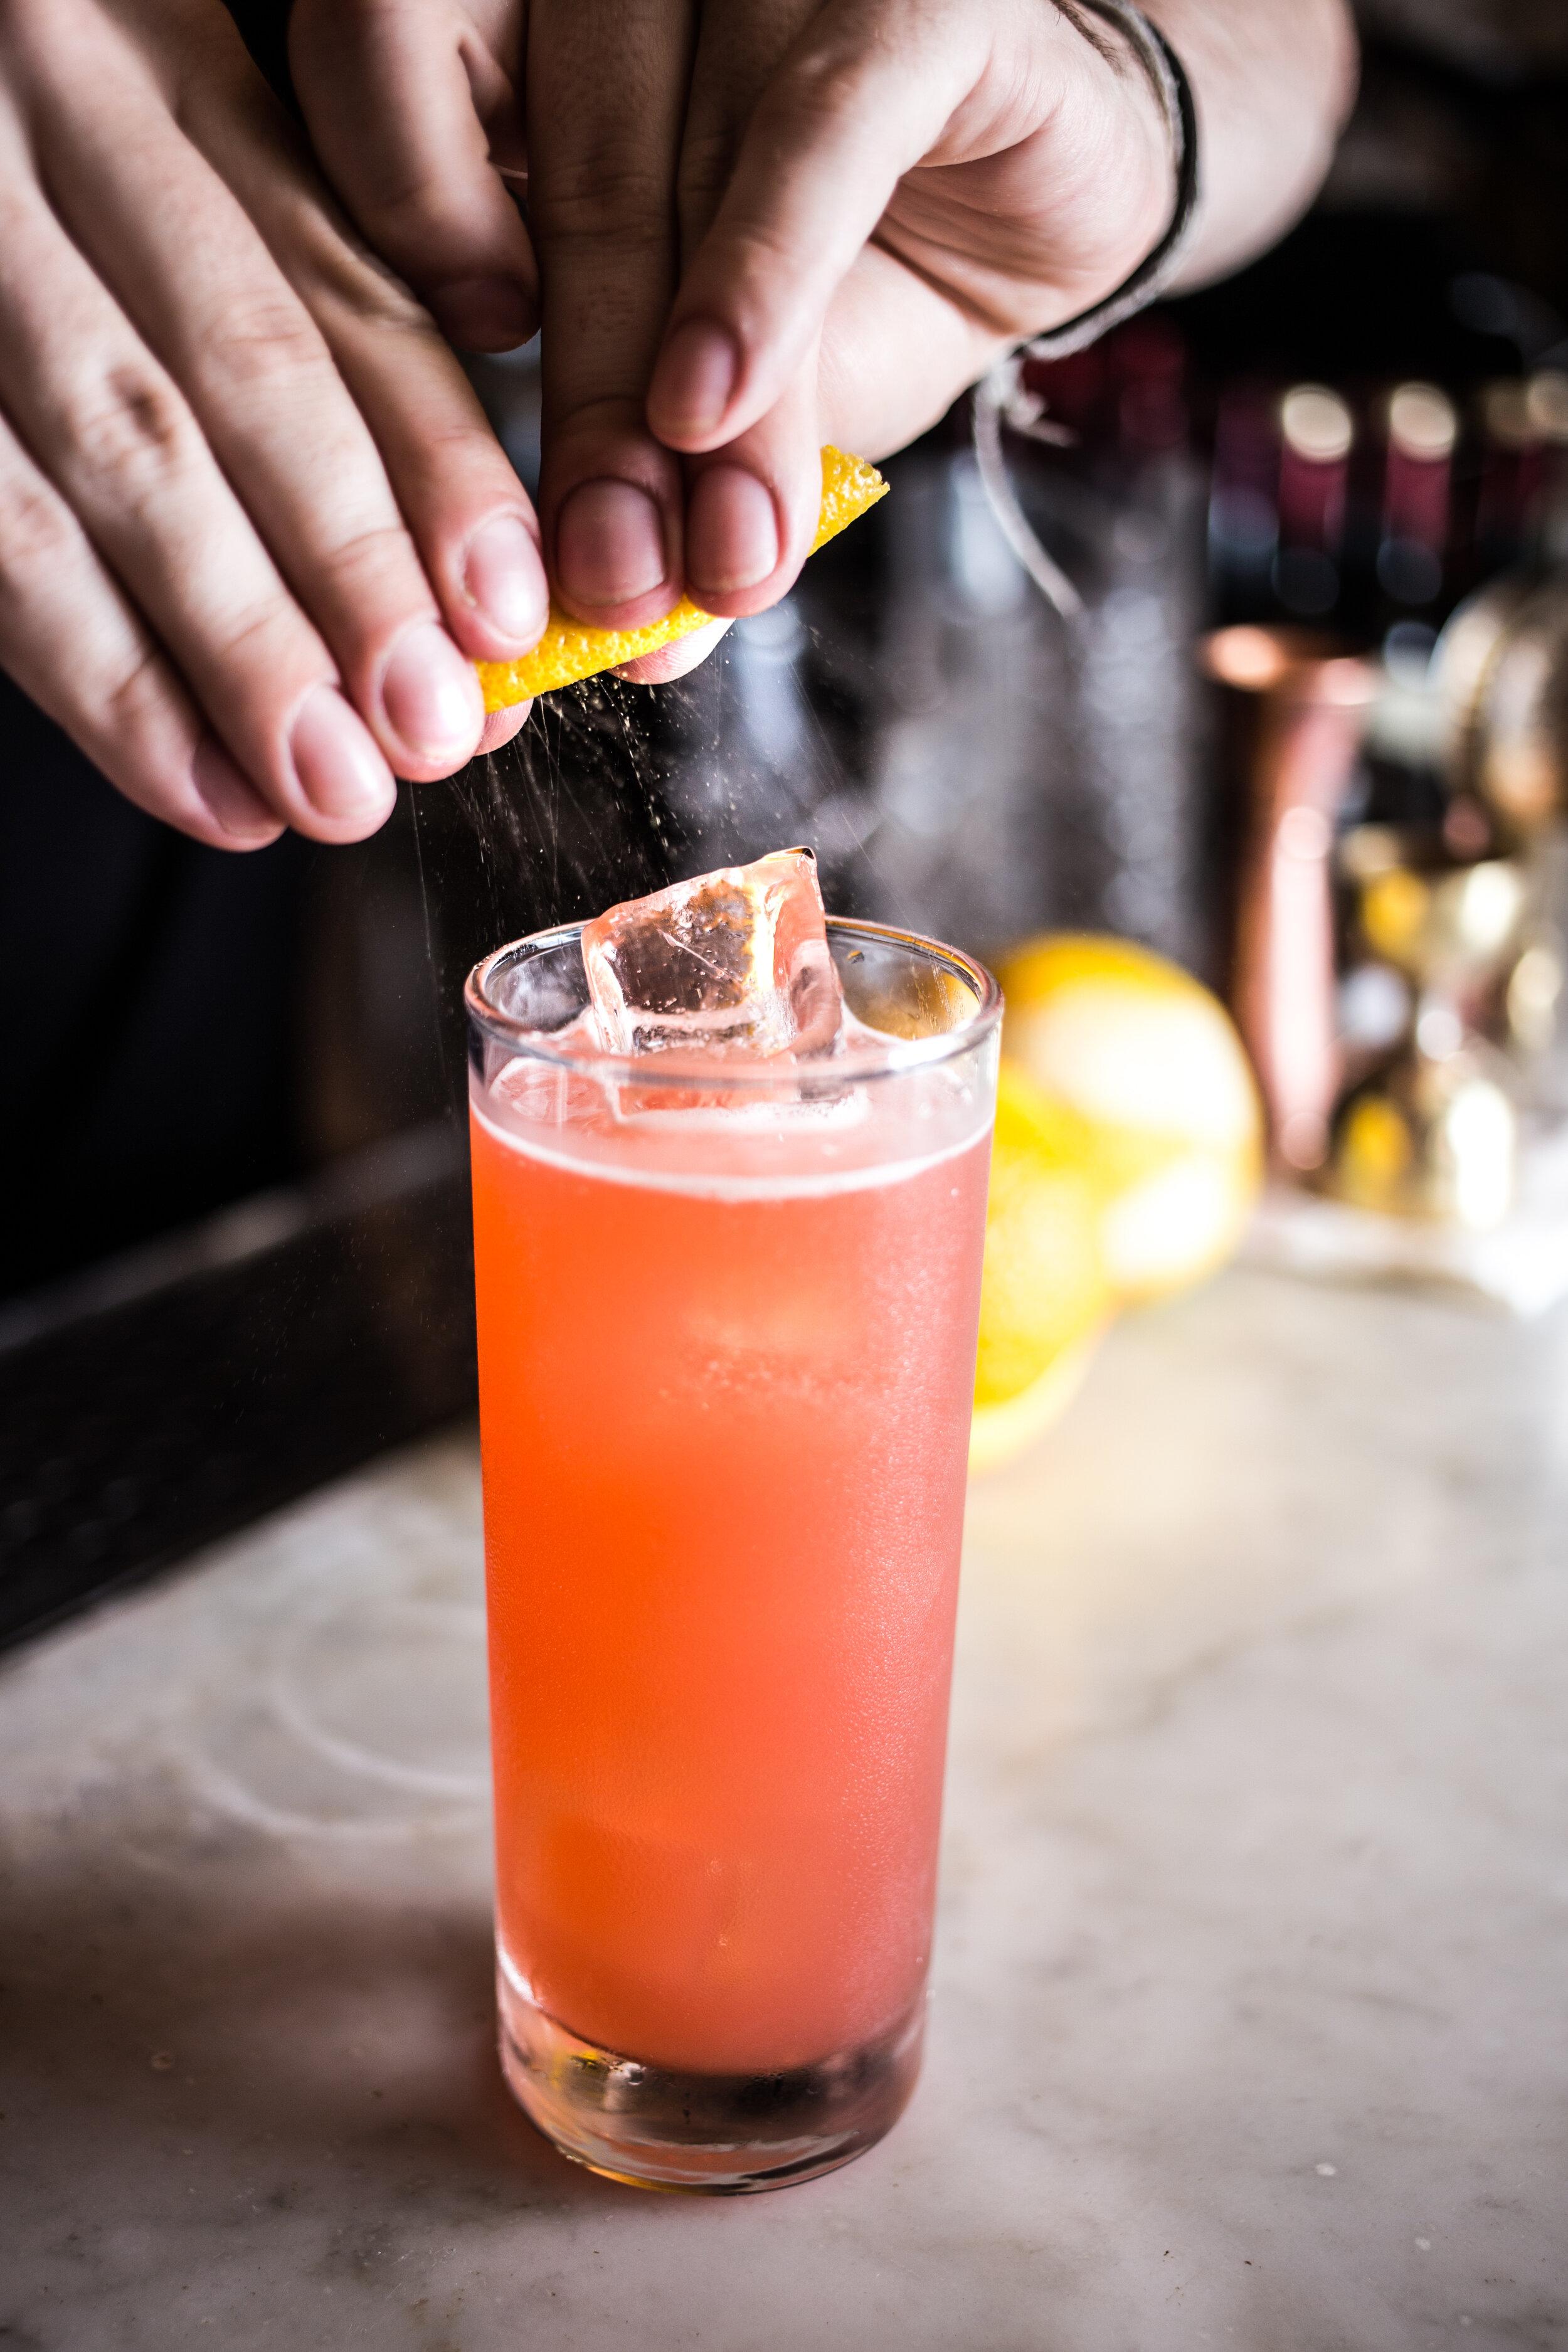 Cocktail-Drink-Bar-Photography-Katie-Foster-4061.jpg